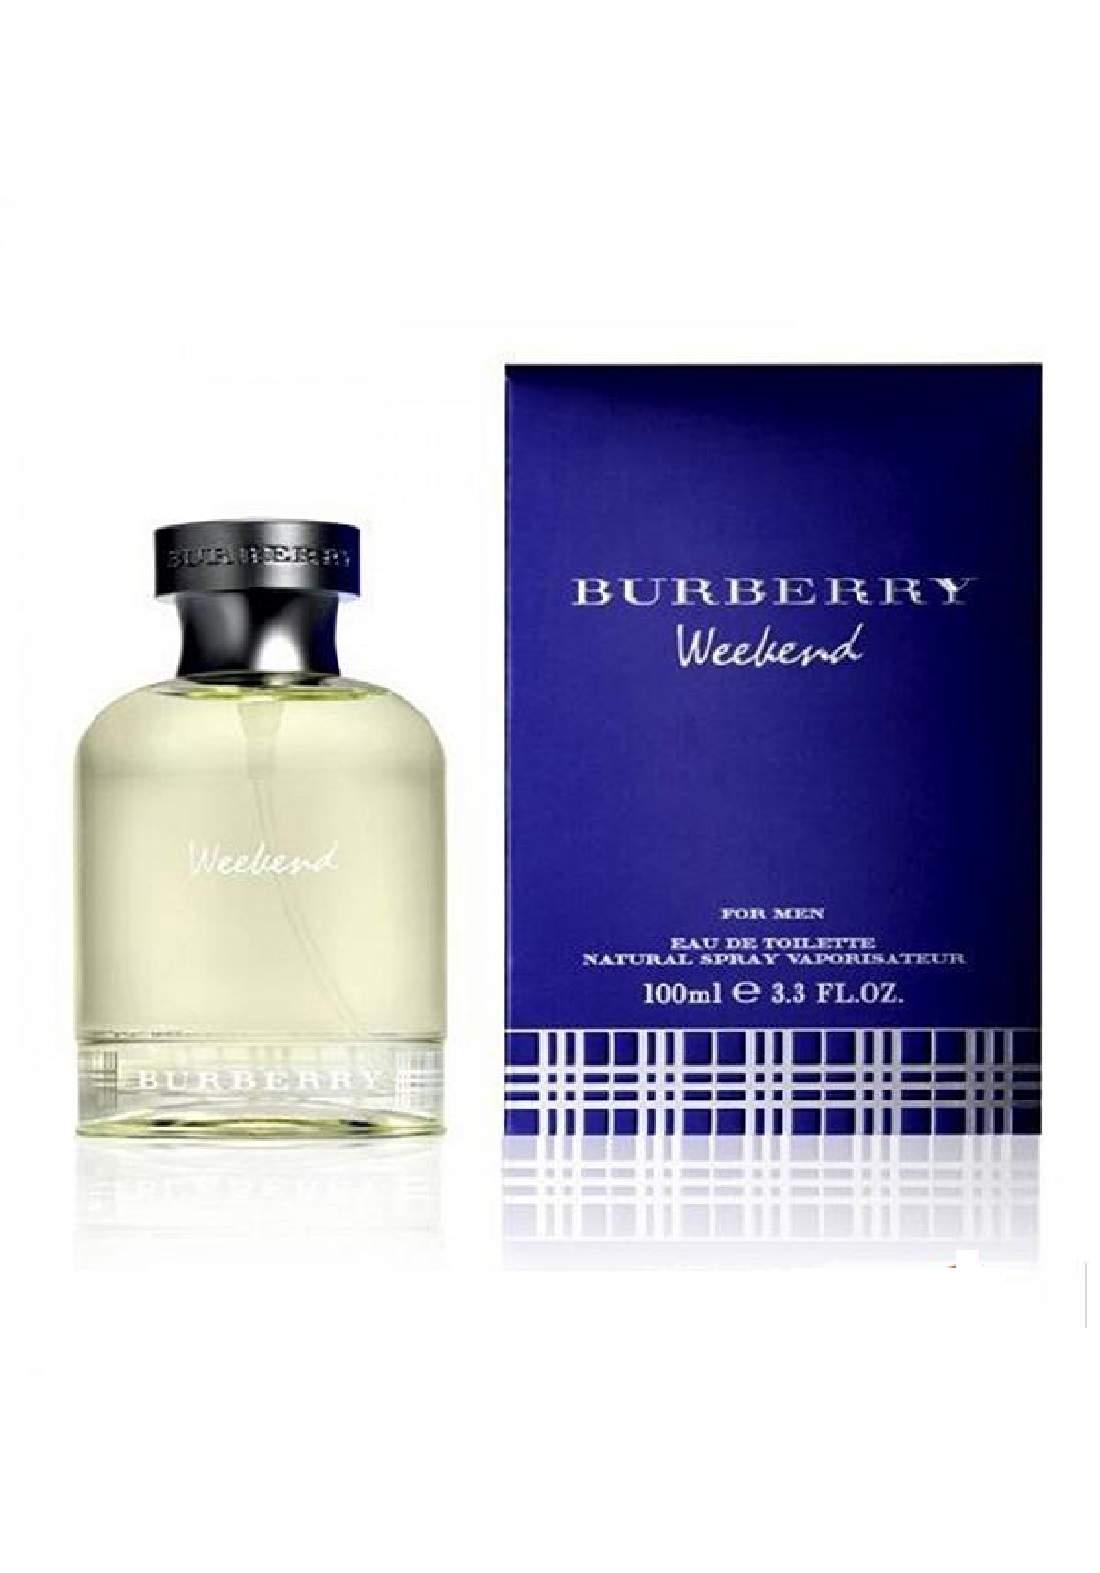 Burberry Weekend Perfume 100 ml For Men عطر رجالي